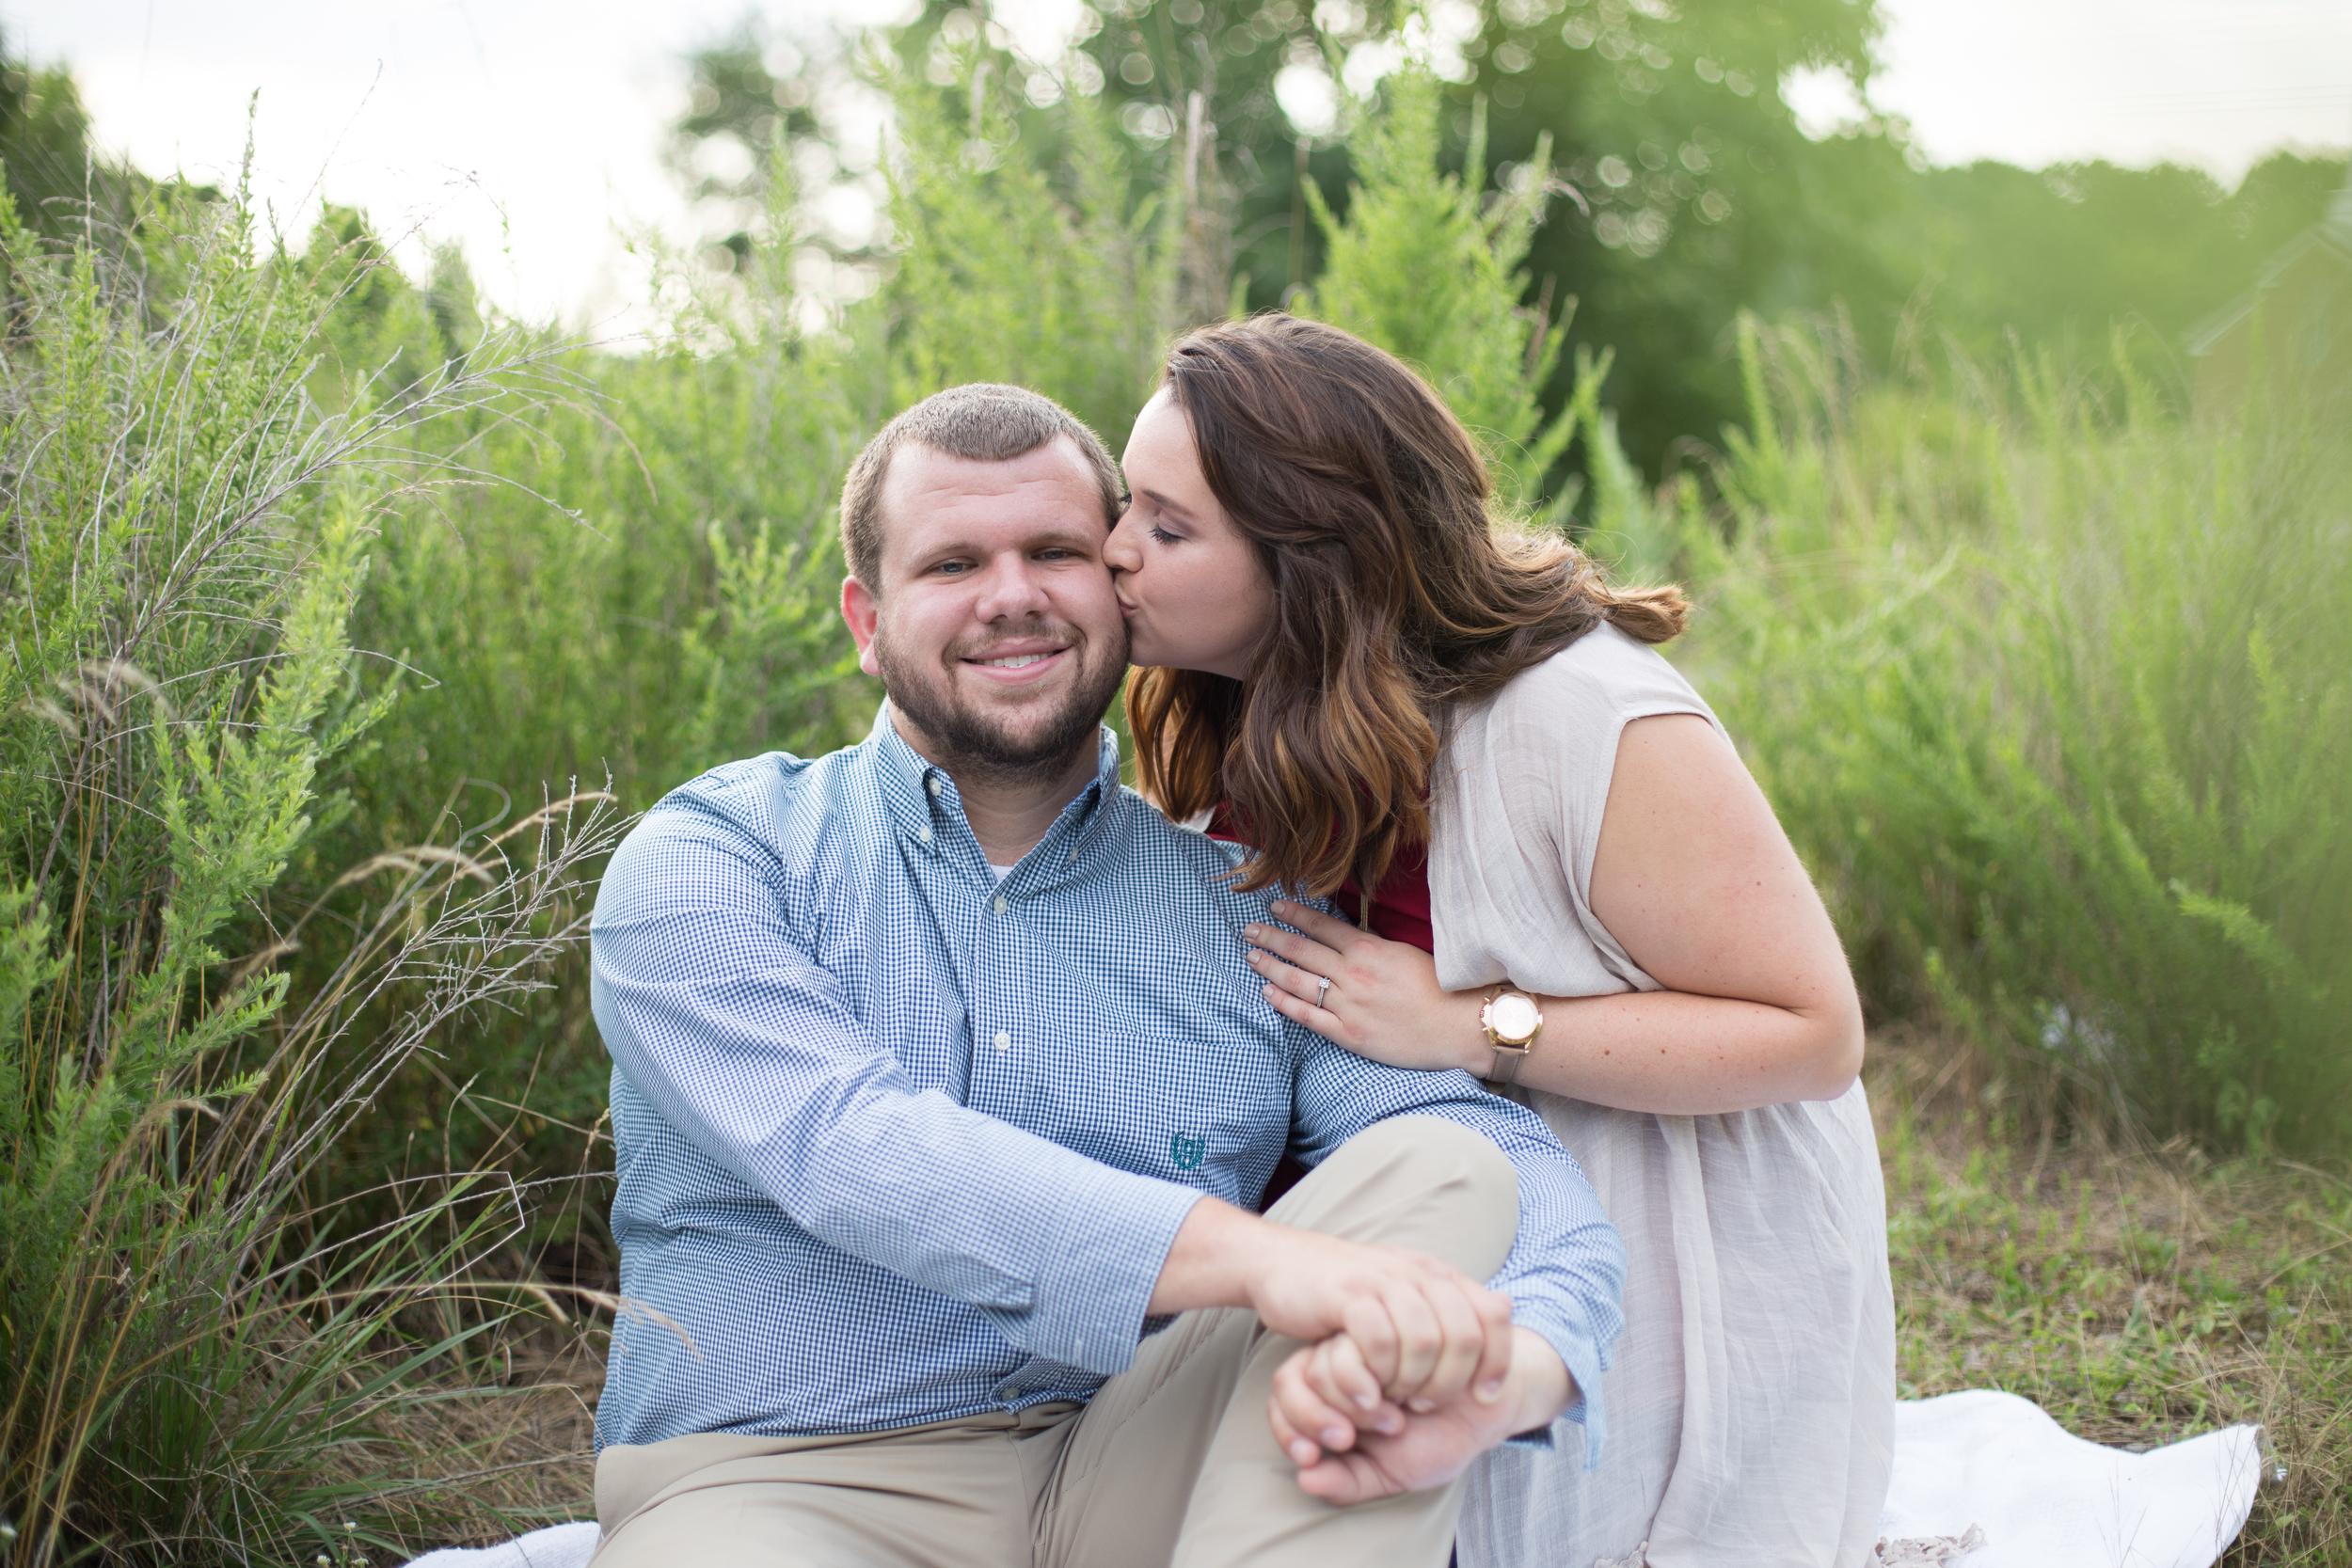 Downtown Clarksville Photo - Clarksville Wedding Photographer - Whit Meza Photography